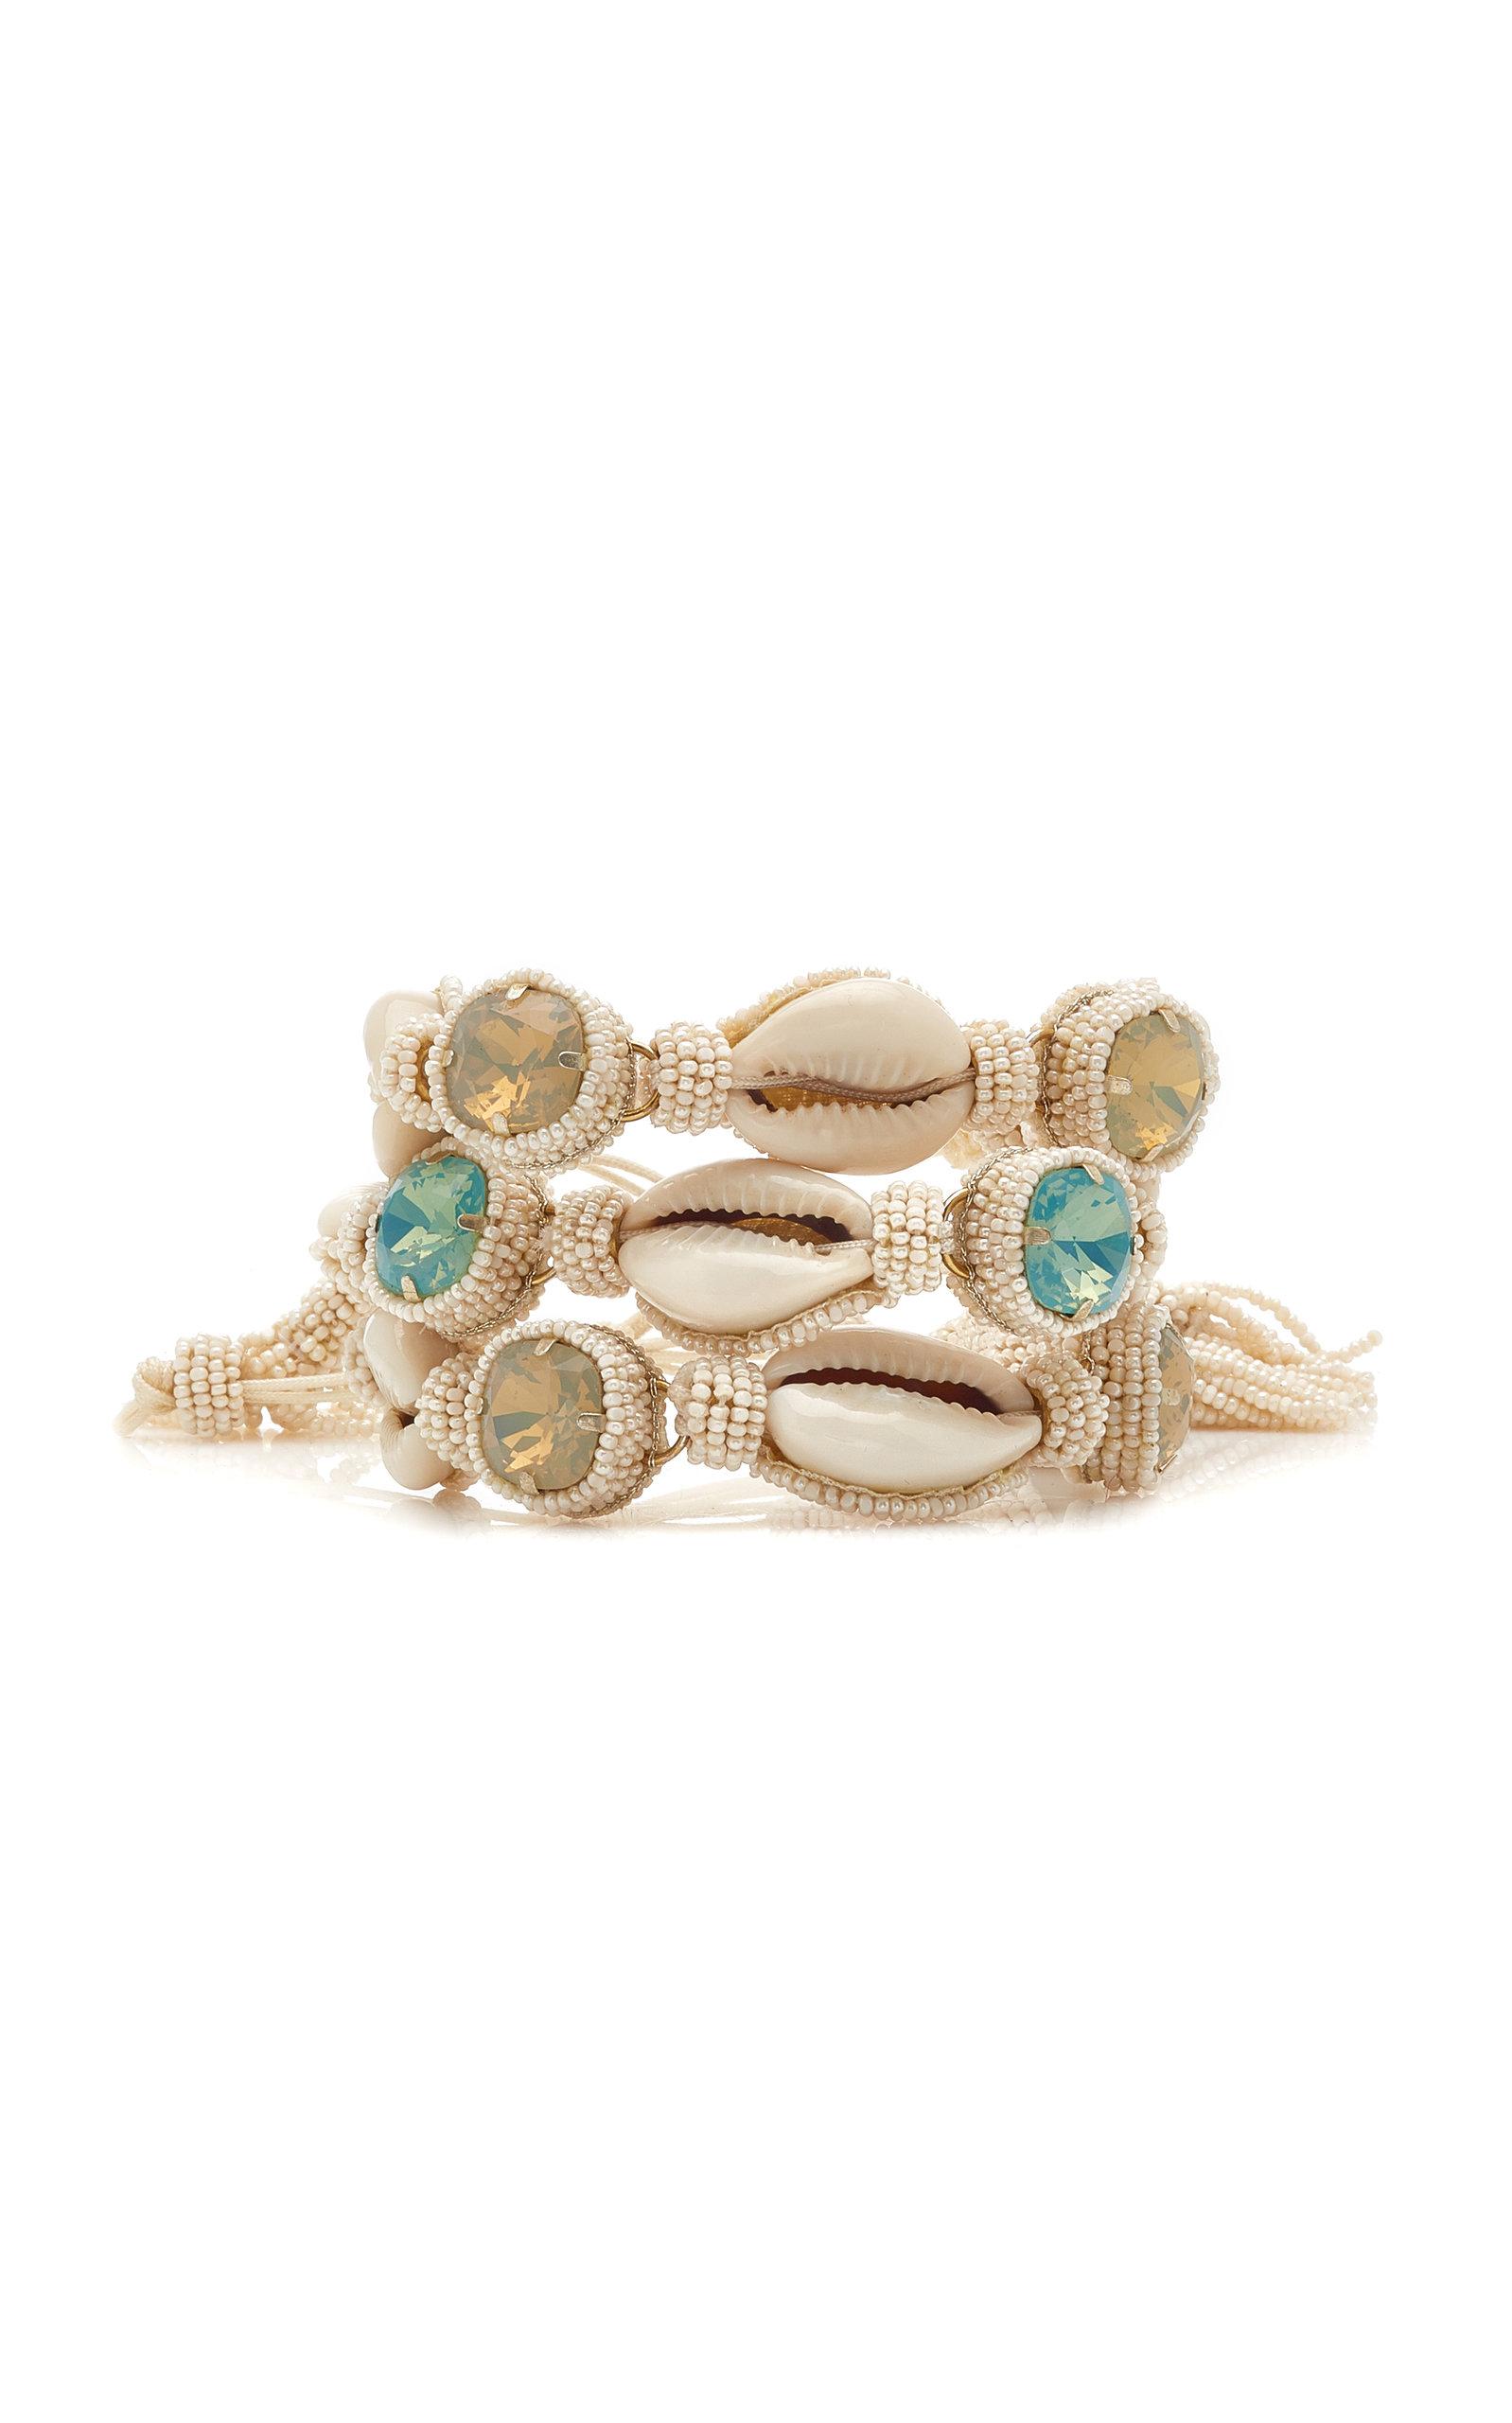 Women's Set of 3 Shell and Macrame Bracelets